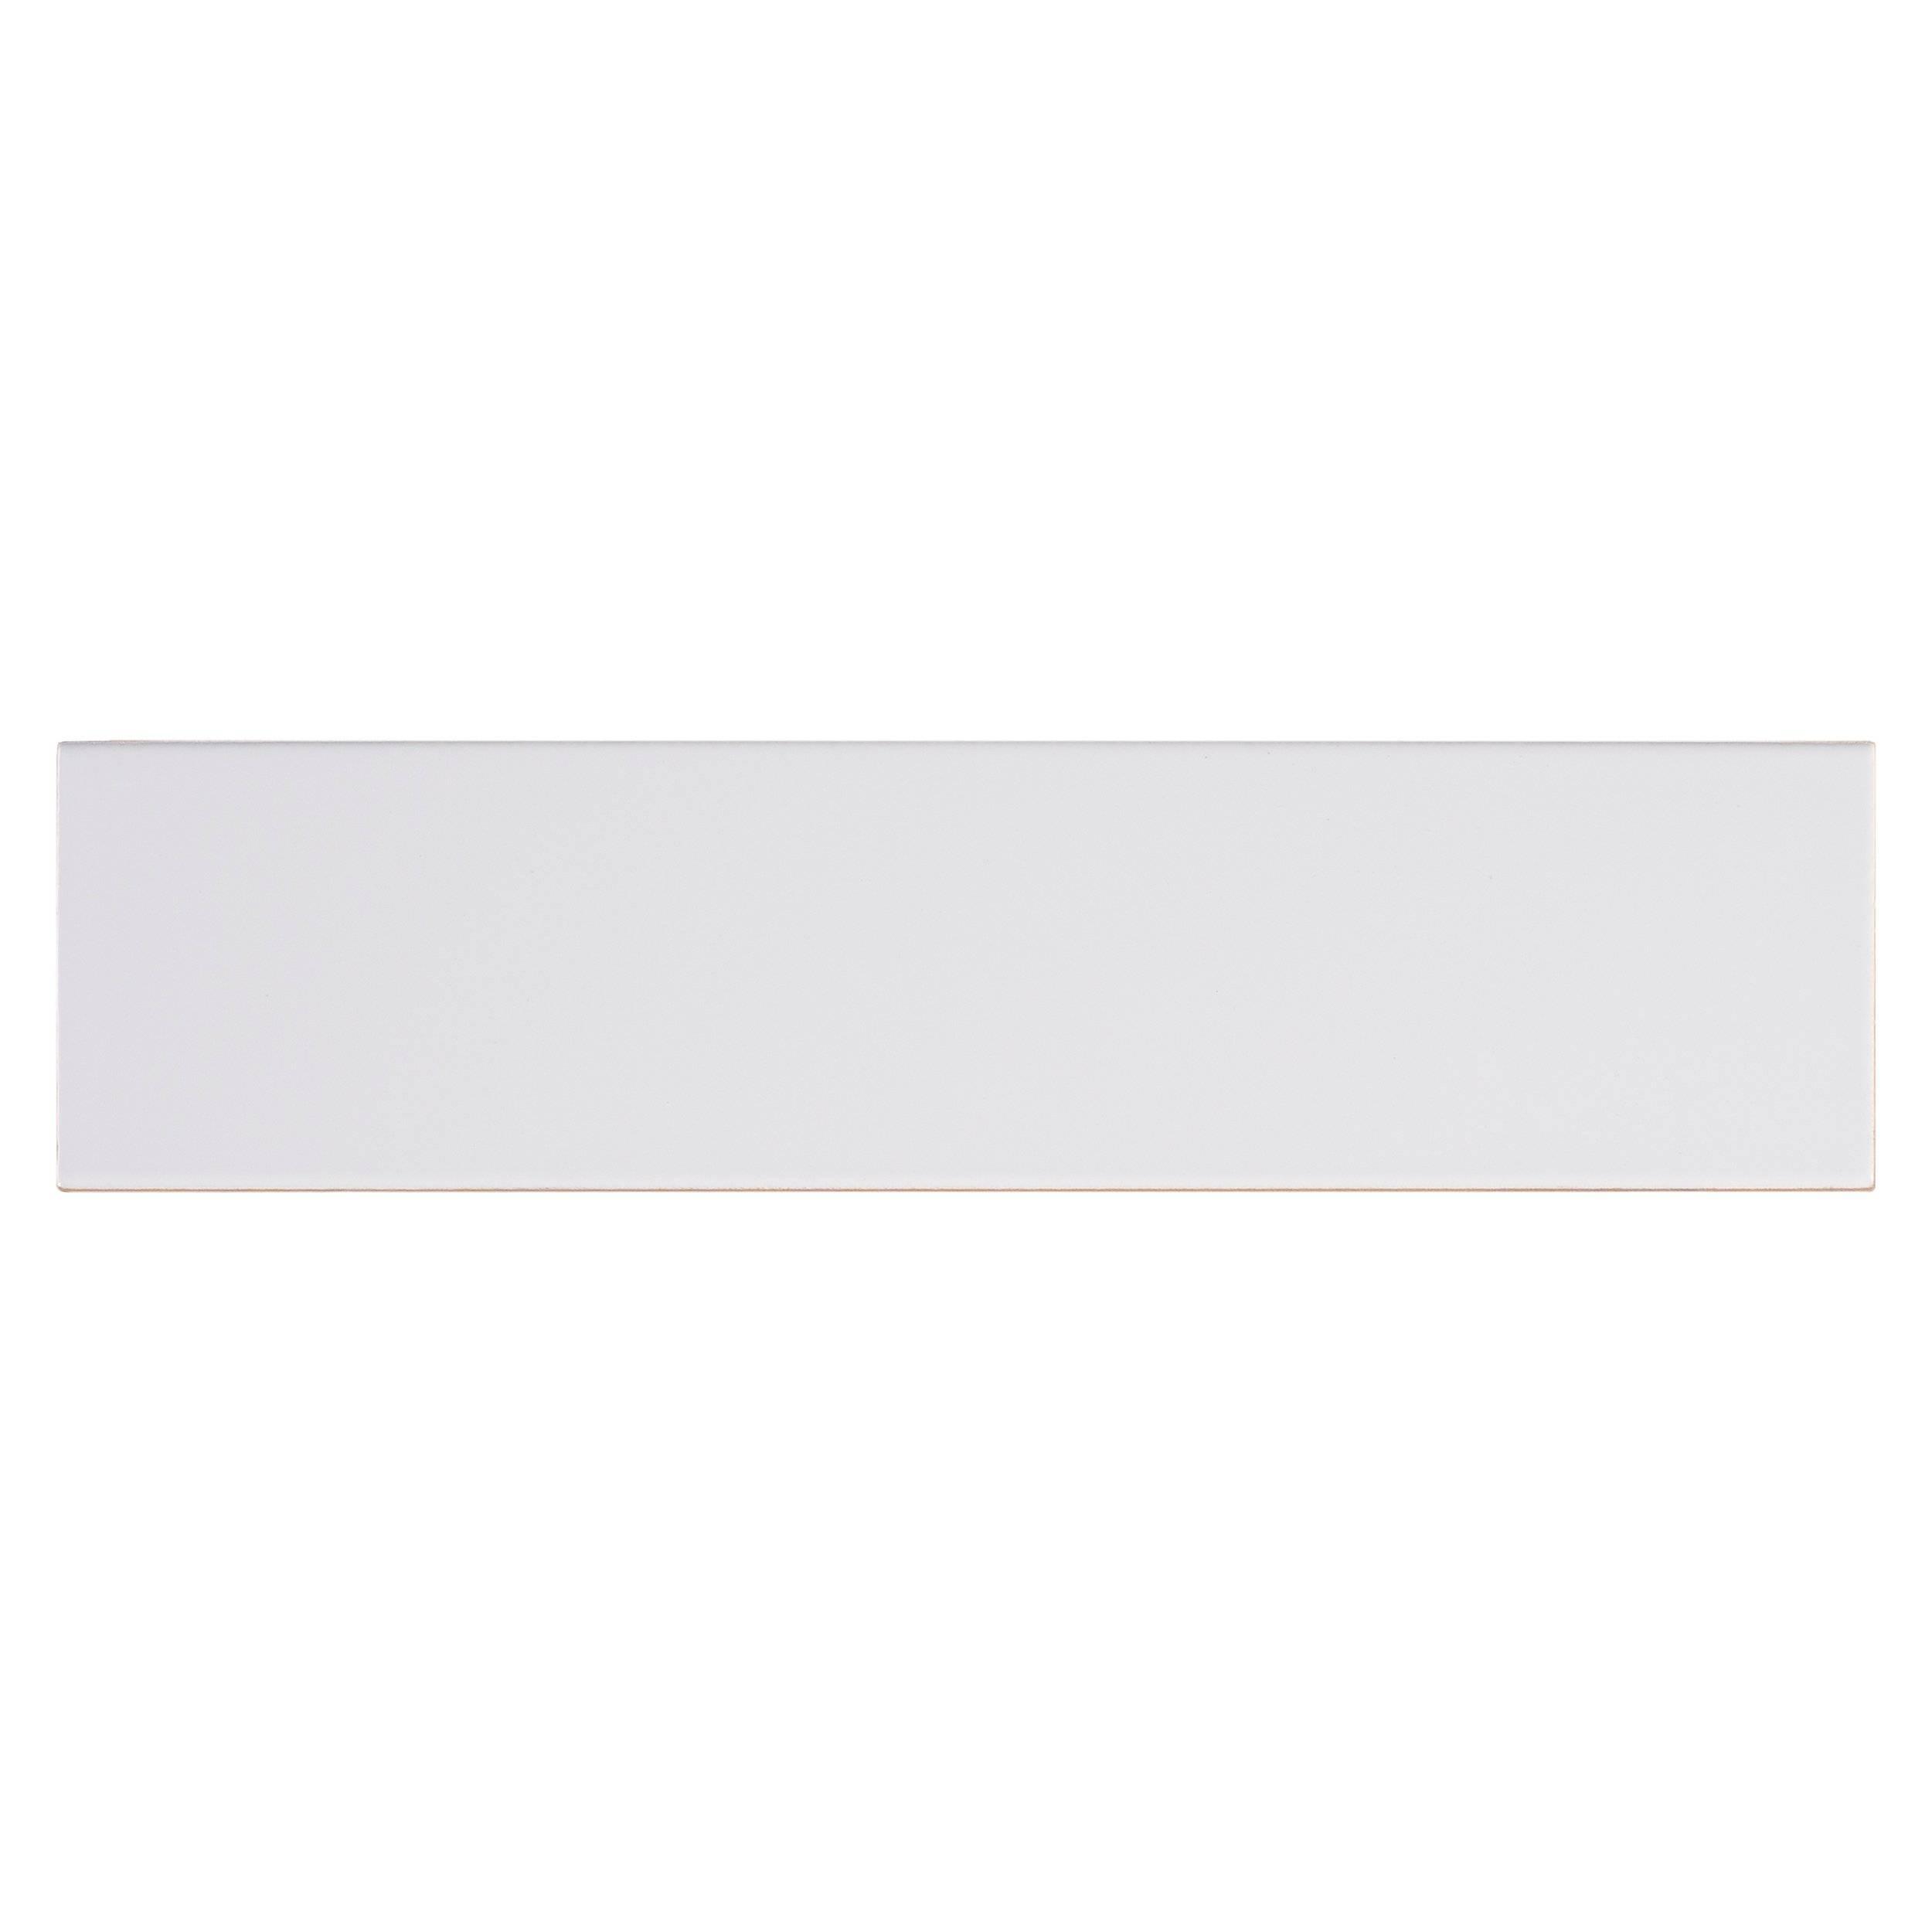 Metro White Glossy Ii Ceramic Tile 4 X 16 100837111 Floor And Decor